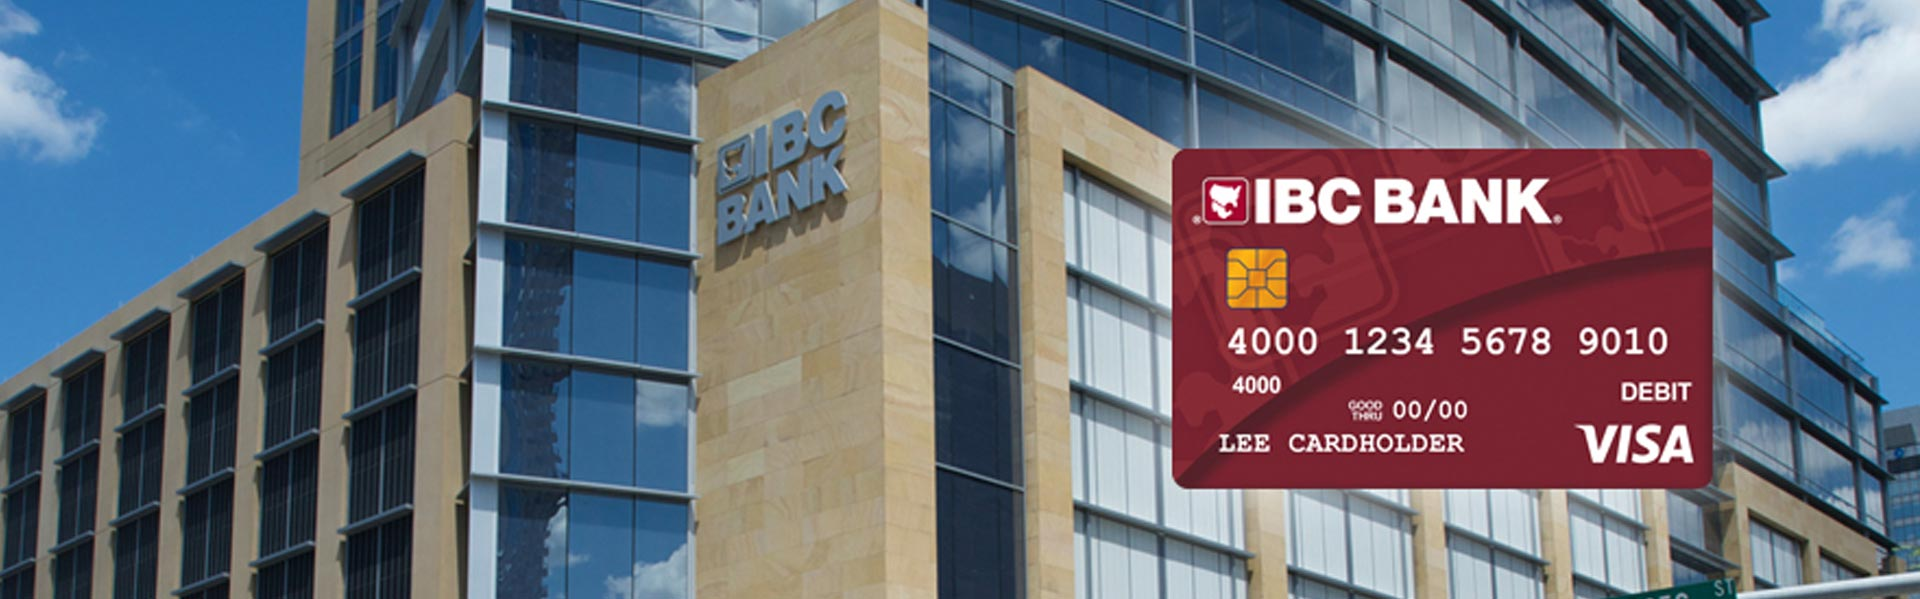 IBC Bank Visa Debit Card